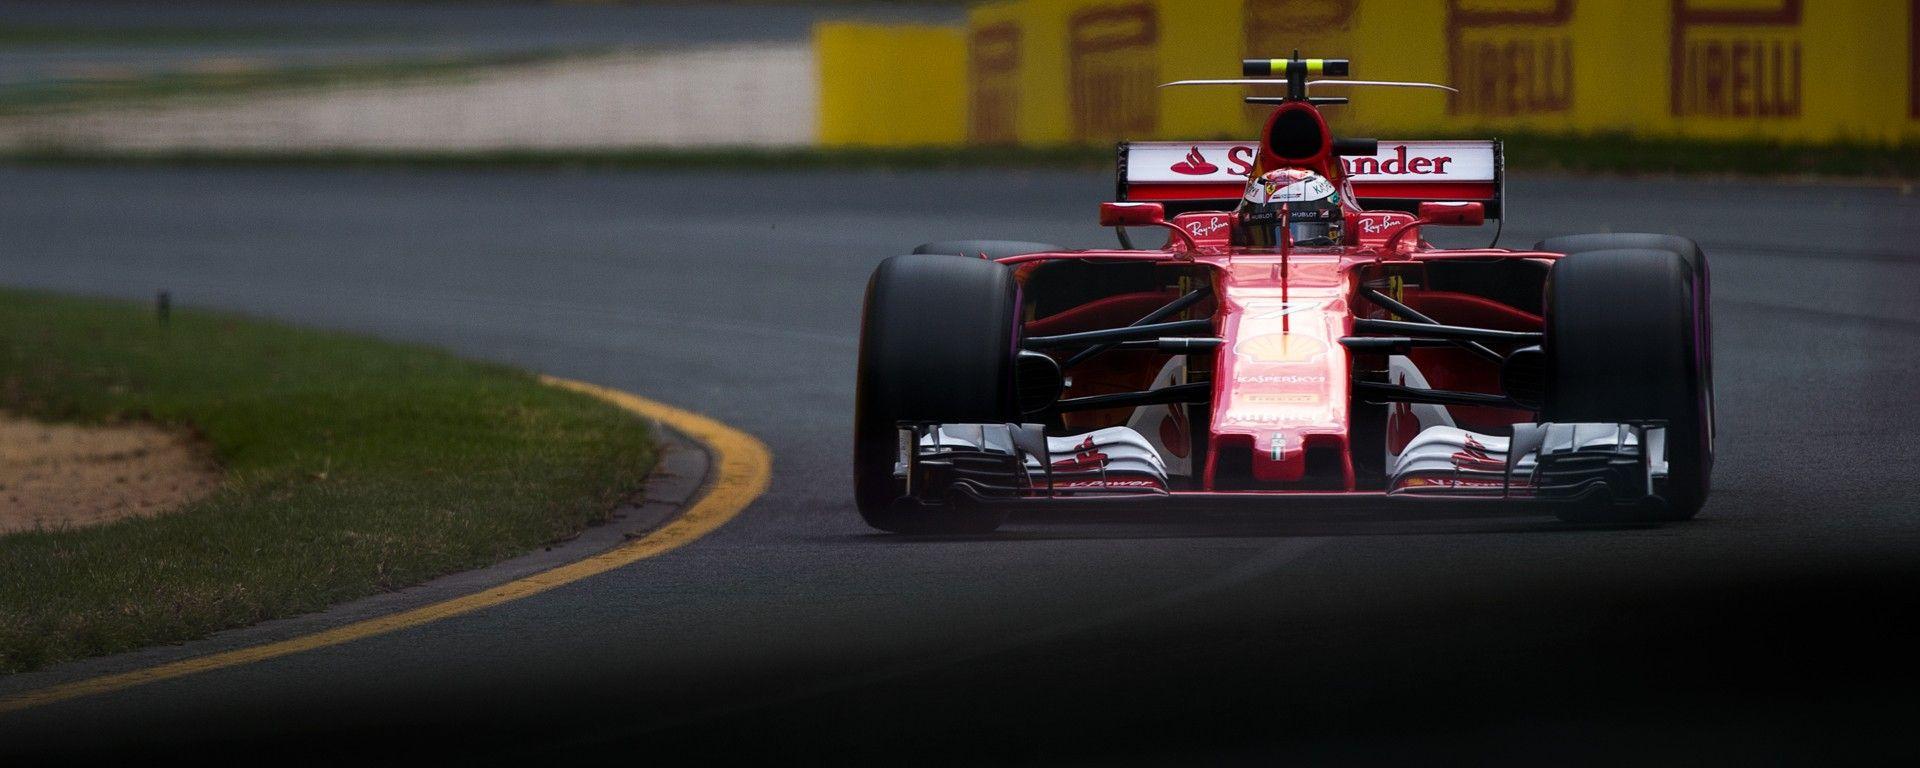 Scuderia Ferrari - Silverstone Circuit